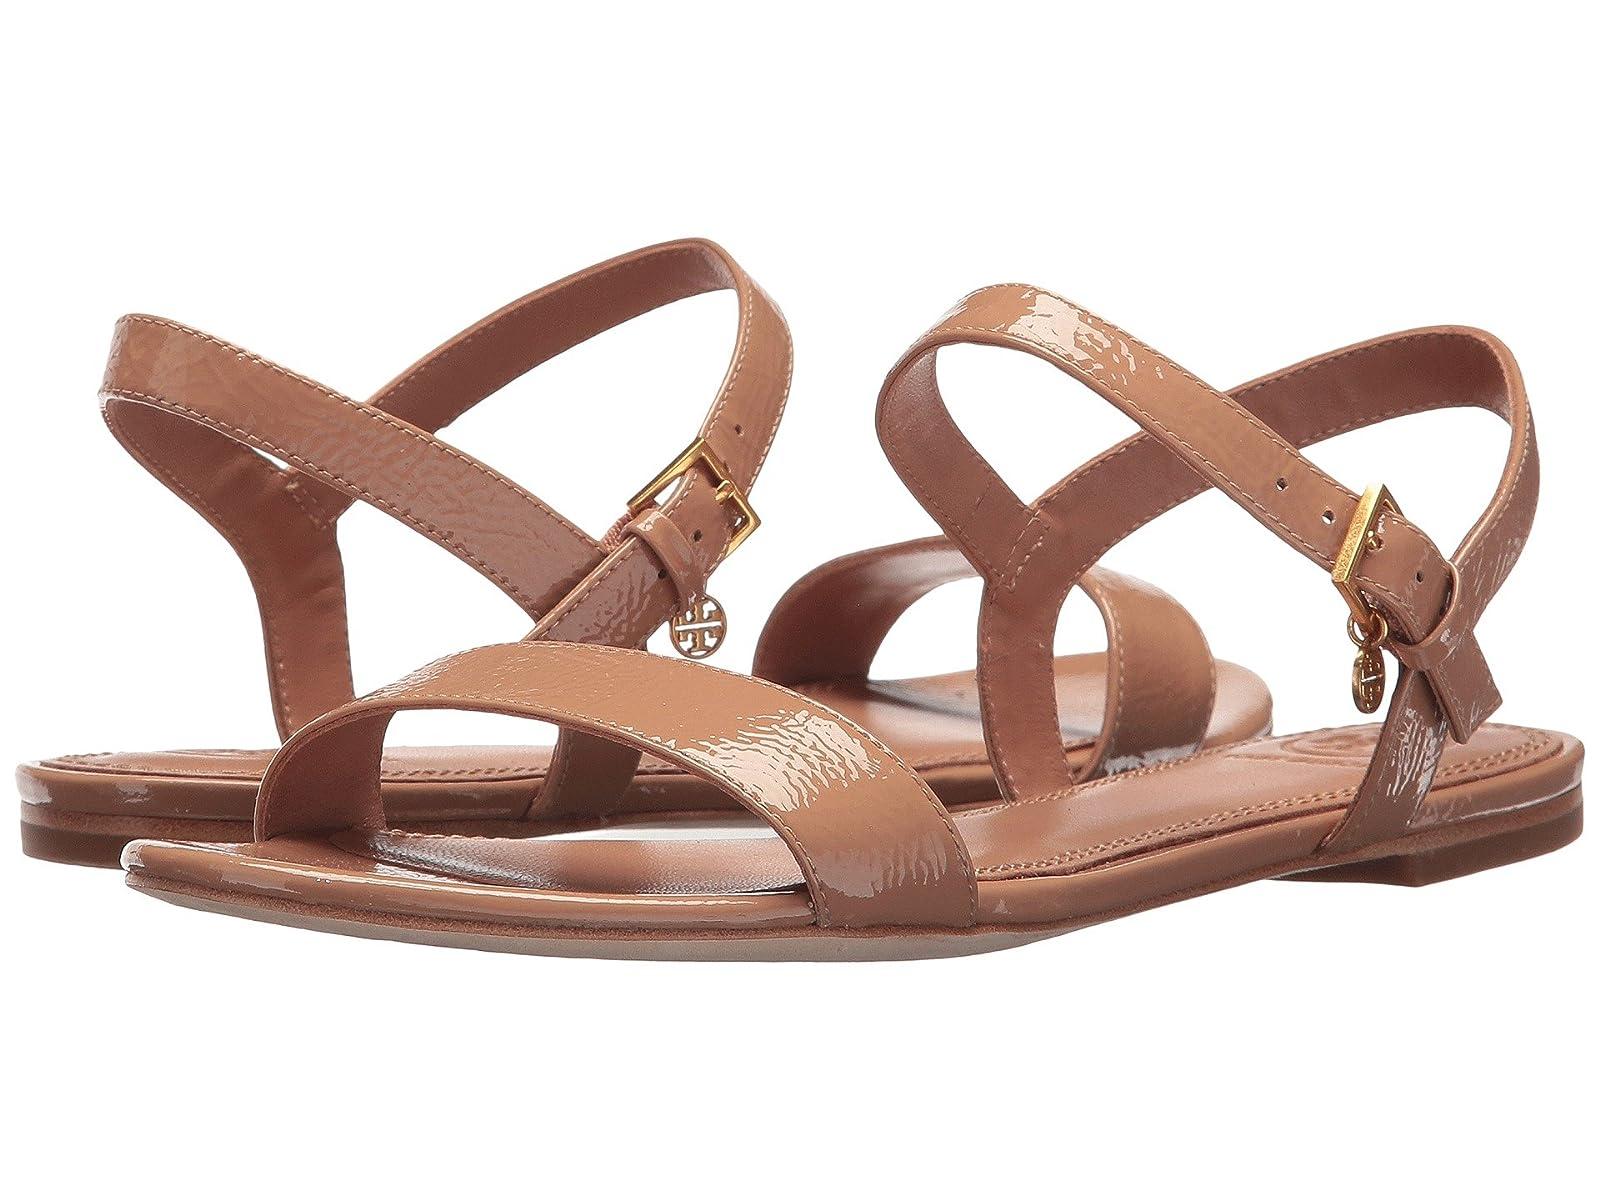 Tory Burch Laurel Flat SandalCheap and distinctive eye-catching shoes